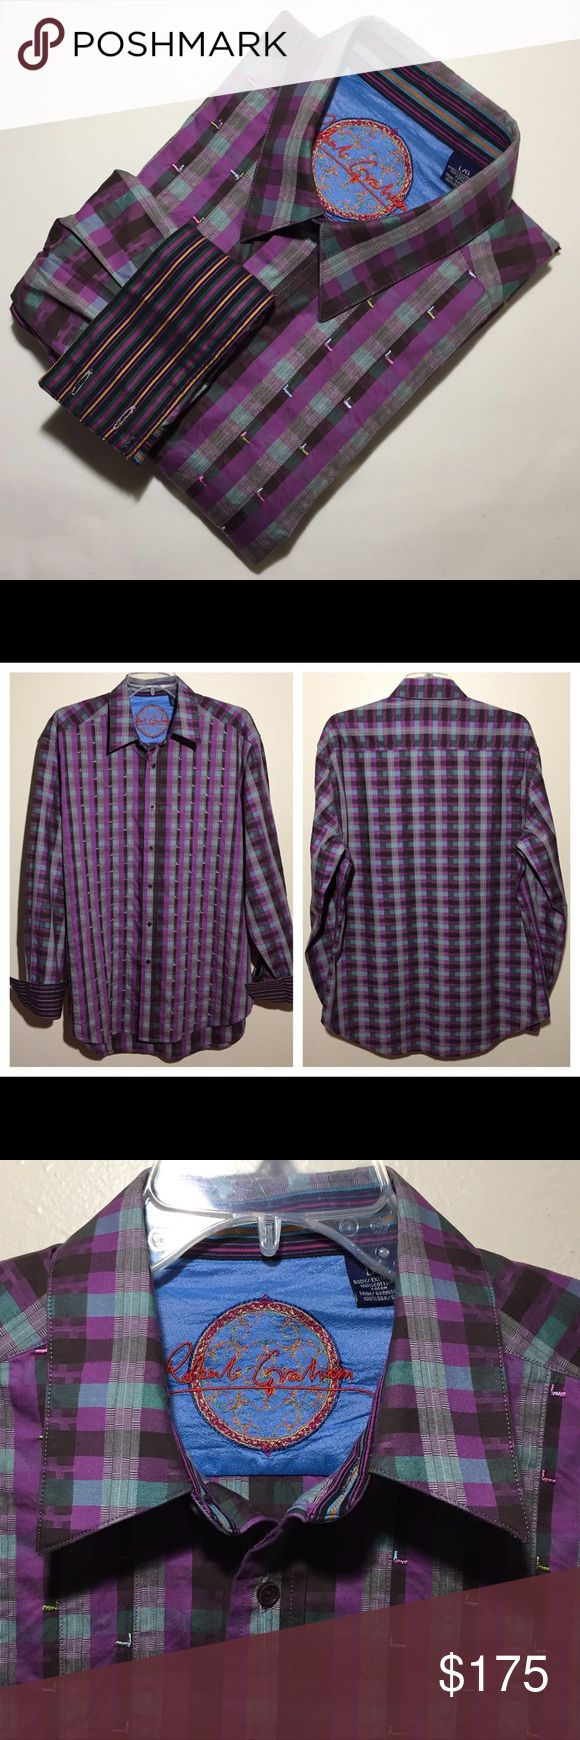 "Robert Graham Long Sleeve Flip Cuff Shirt Excellent condition. Robert Graham Button Down Cotton Woven Shirt Flip Cuffs  MEASUREMENTS: ACROSS SHOULDER: 20"" ACROSS PIT TO PIT: 24.5"" BACK LENGTH: 32"" SLEEVE LENGTH: 25.5"" Robert Graham Shirts Casual Button Down Shirts"